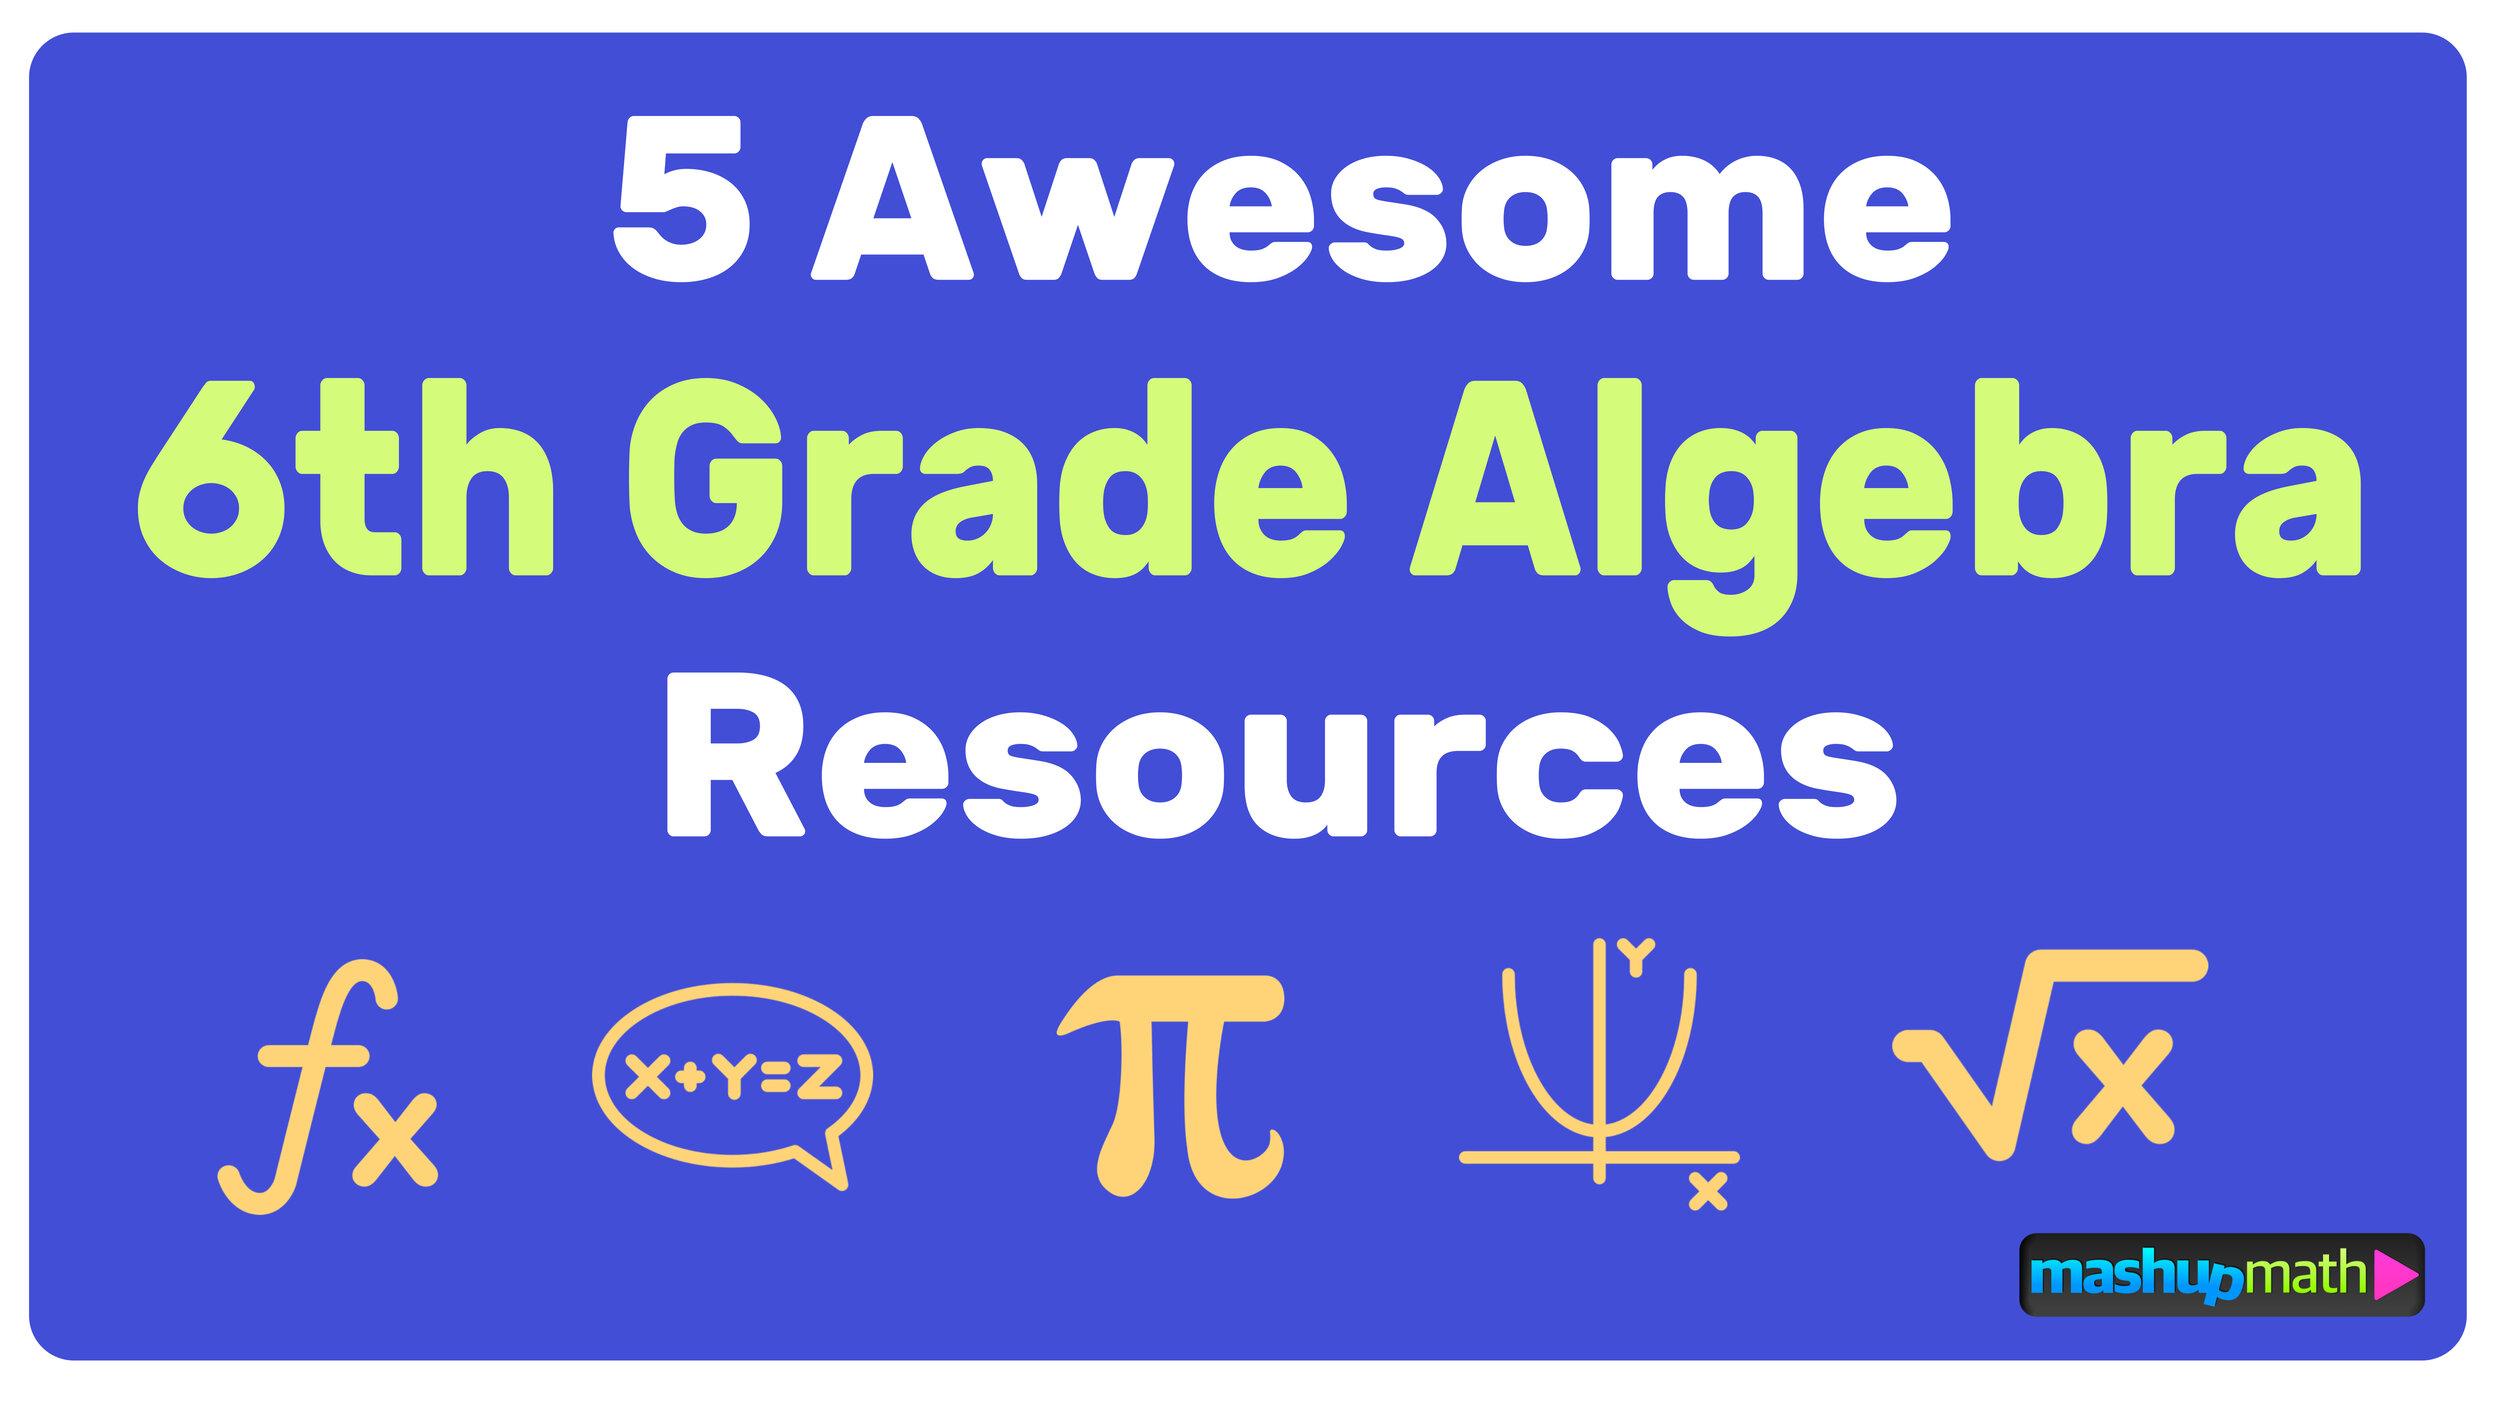 medium resolution of Free 6th Grade Algebra Resources — Mashup Math